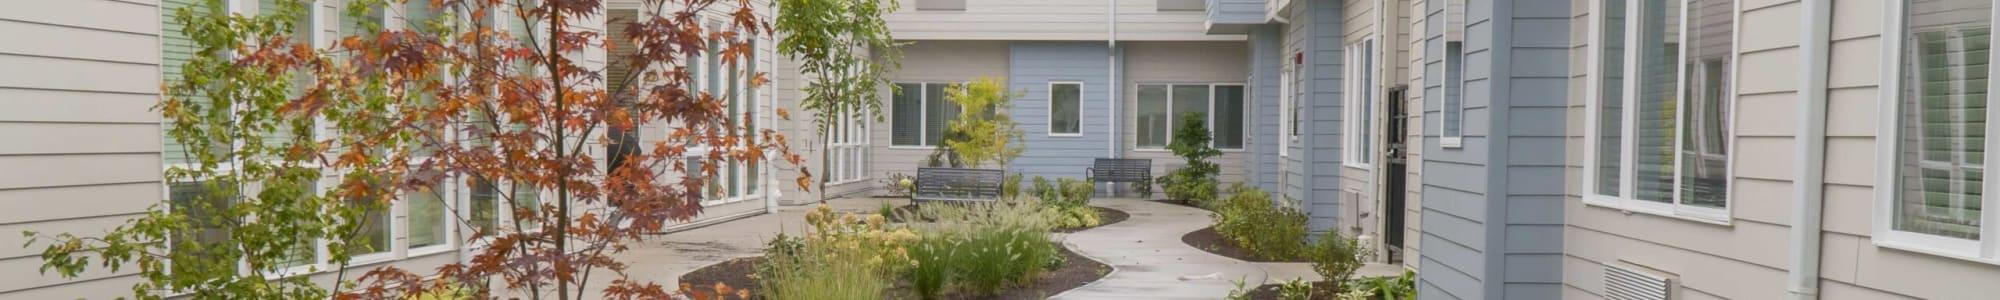 Resources at HOLI Senior Living in Hillsboro, OR